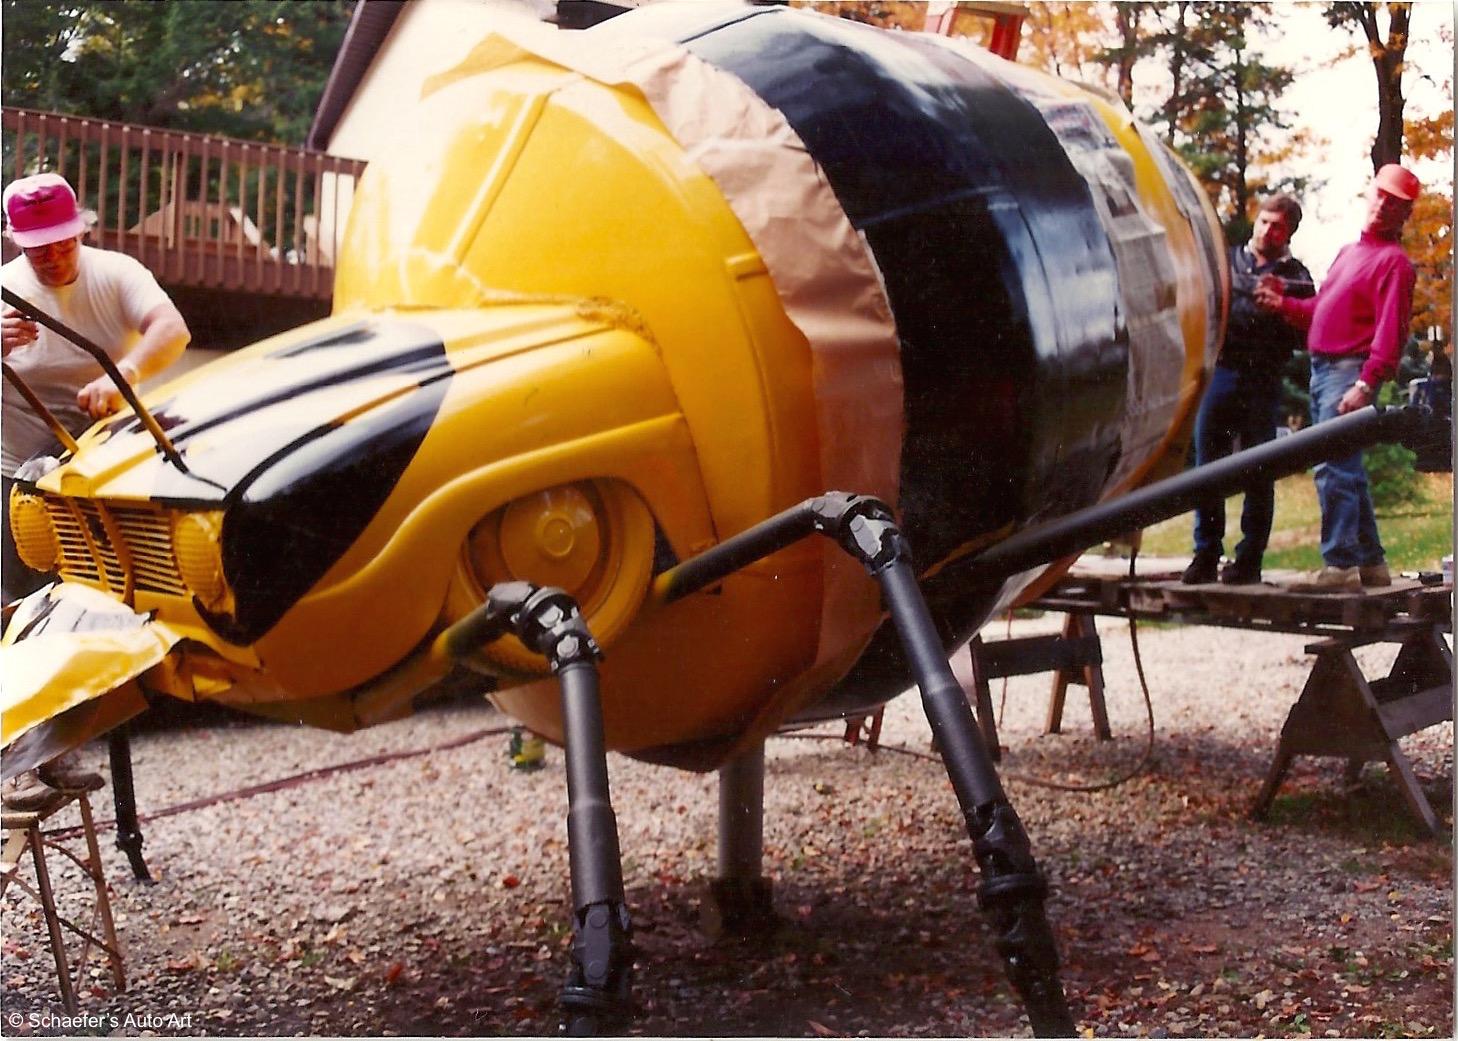 Bumblebee_Schaefers Auto Art3.jpeg